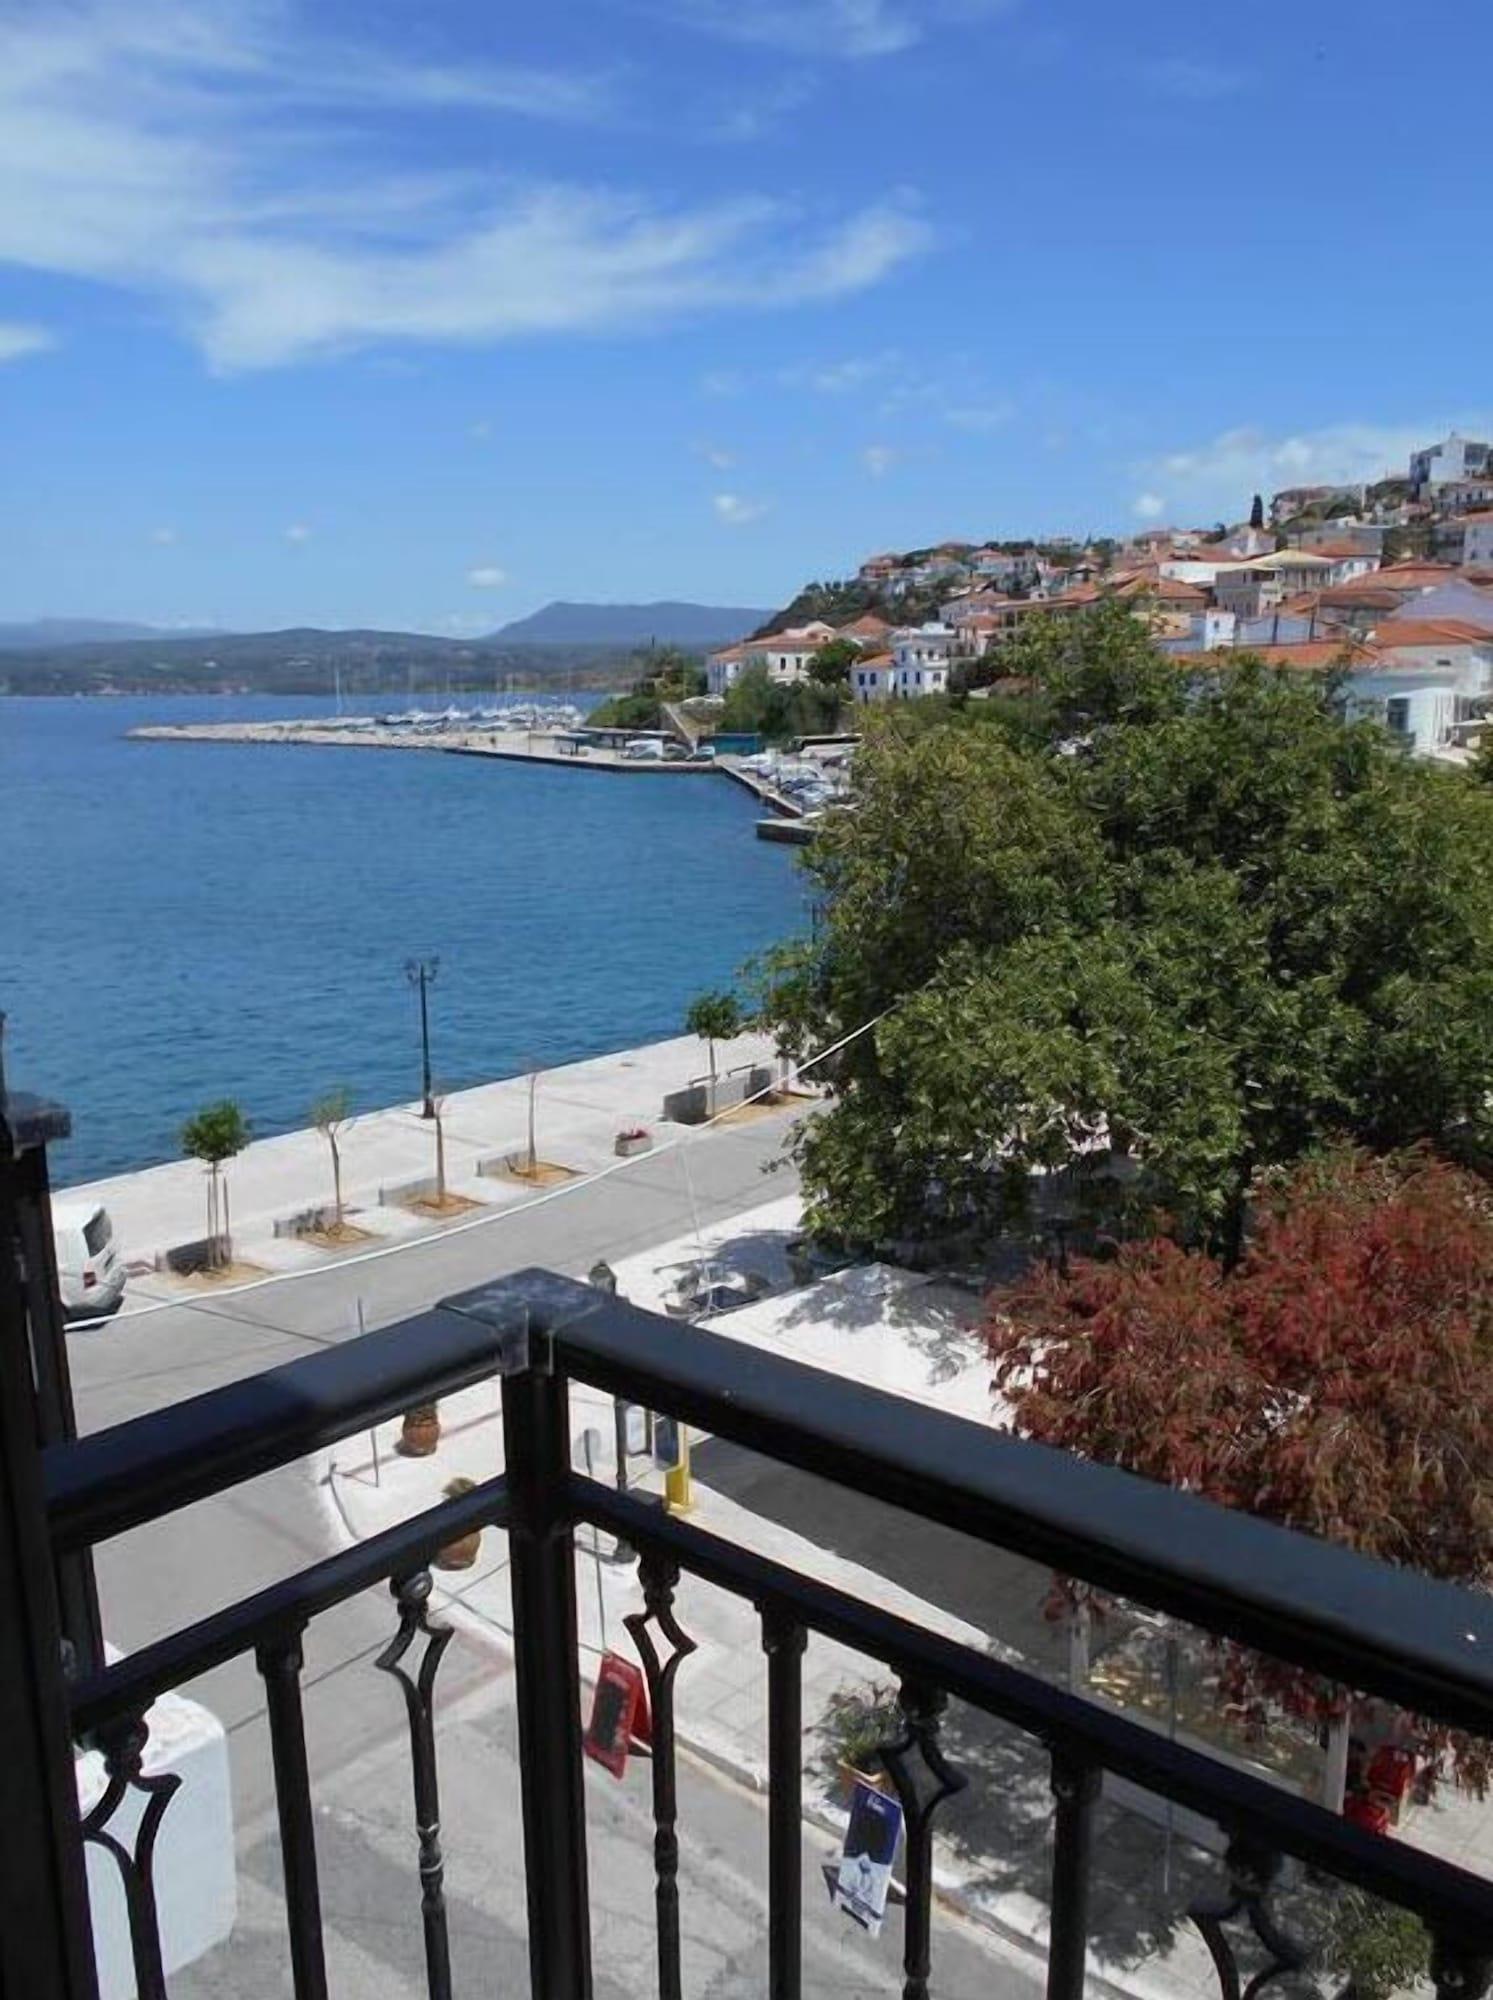 Galaxy Hotel, Peloponnese